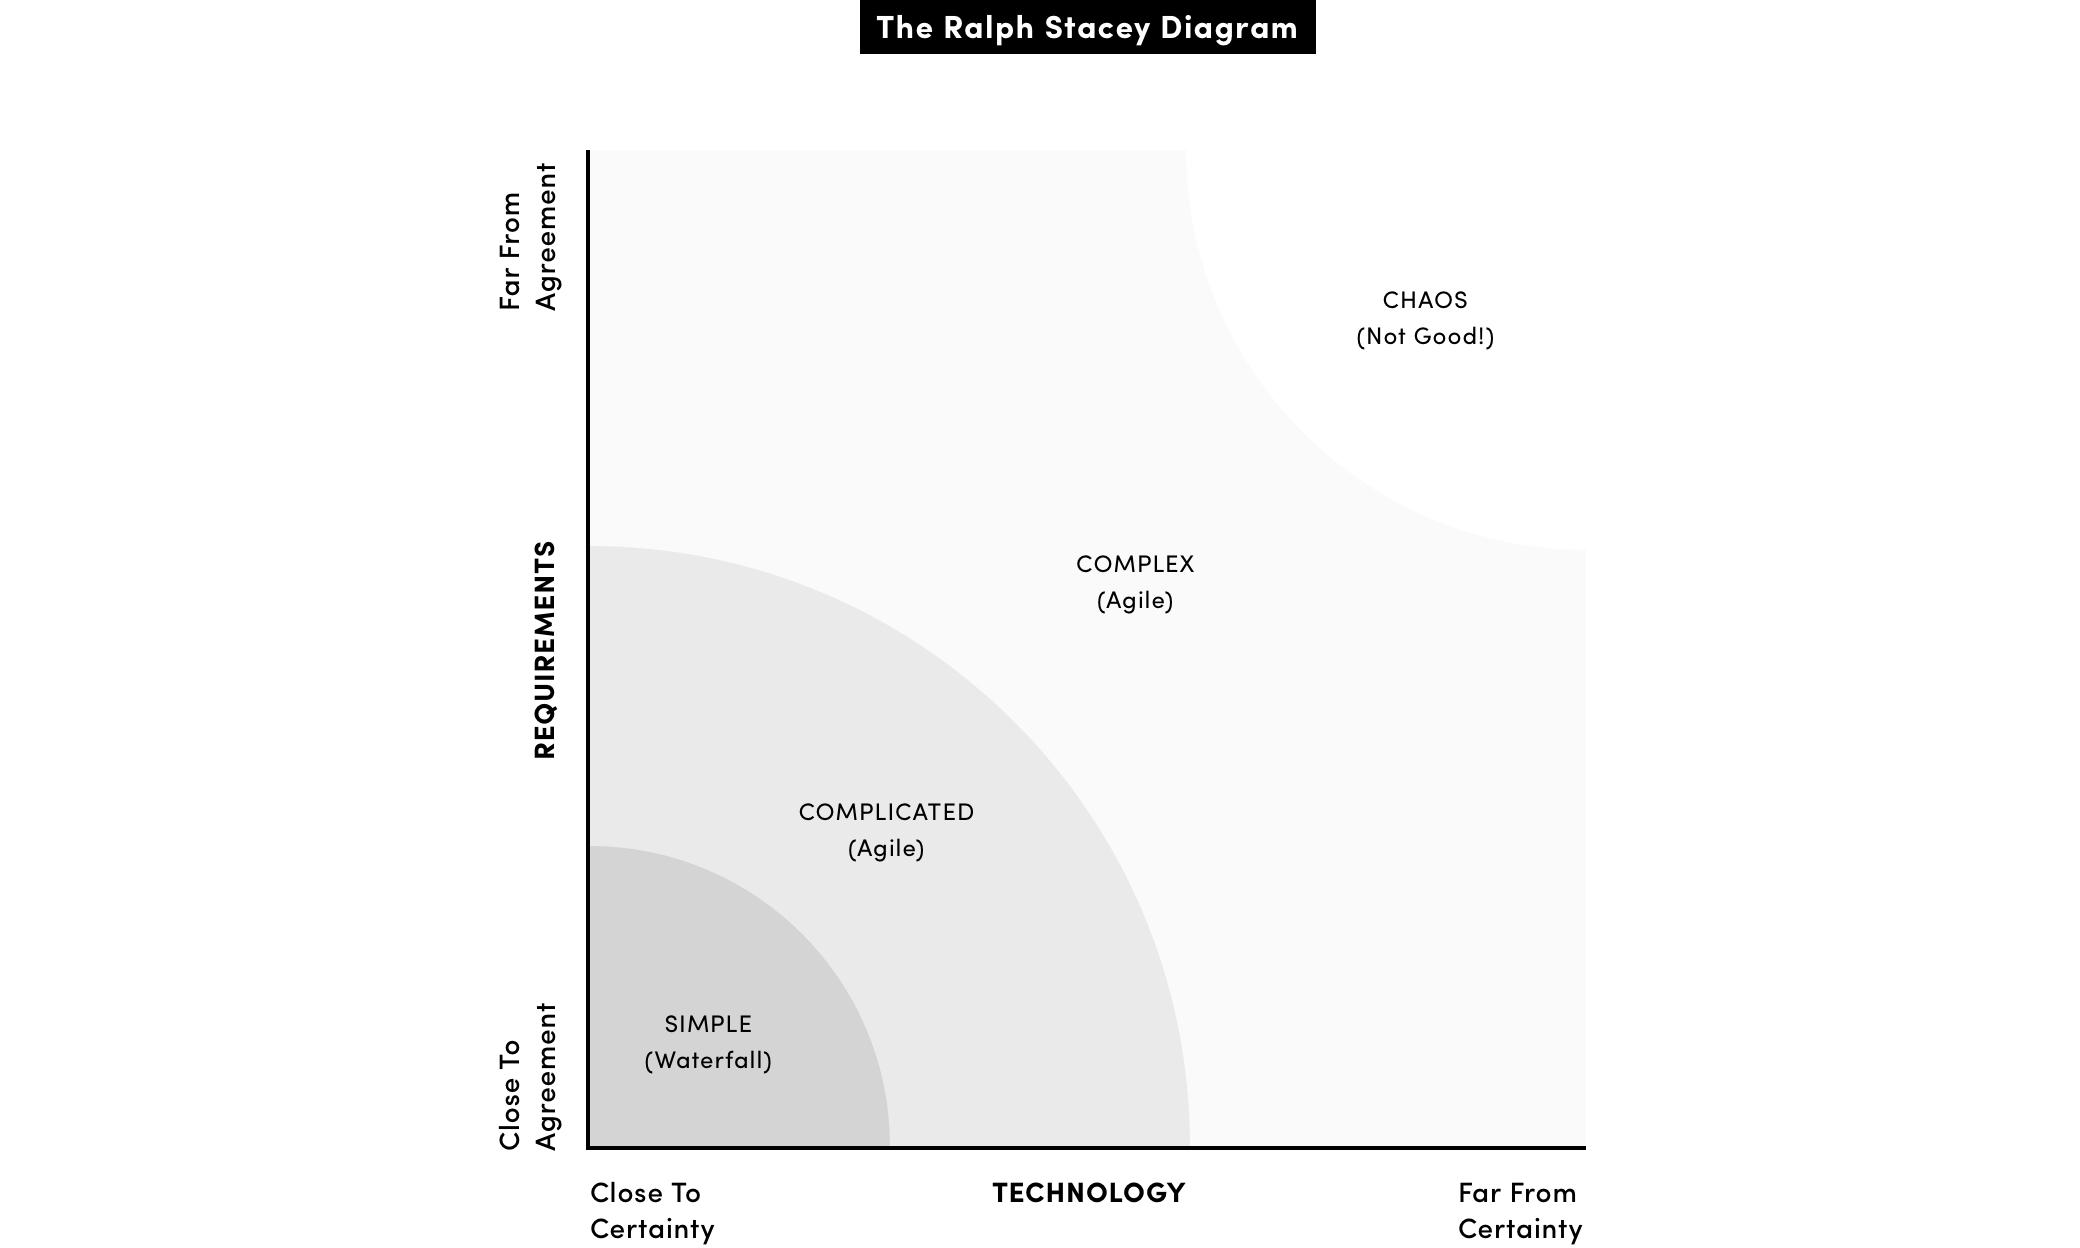 ralph-stacey-diagram.jpg